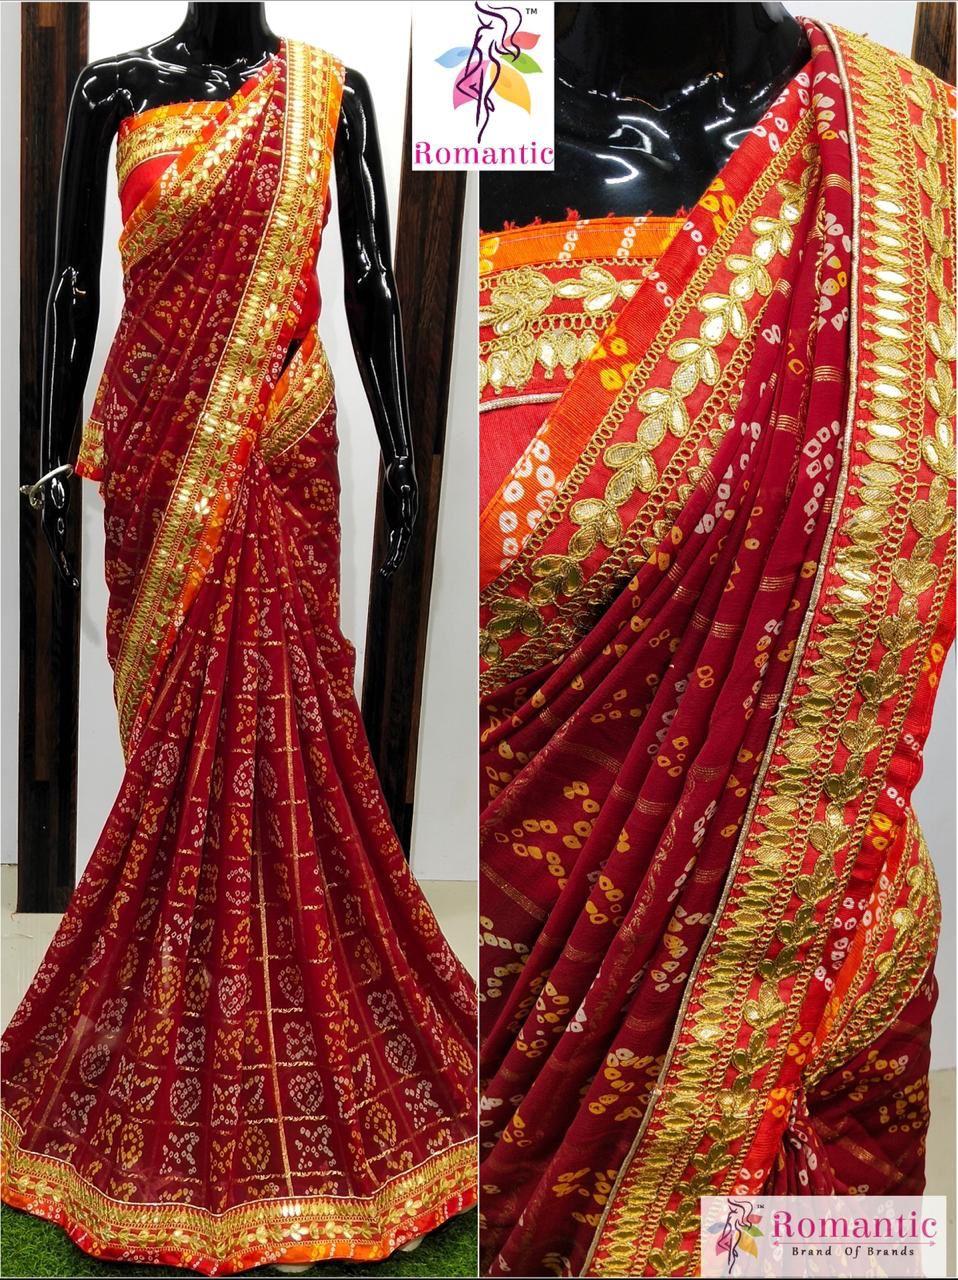 Indian Rajasthani Pure Georgette Saree with Heavy Gota Patti wedding Sari